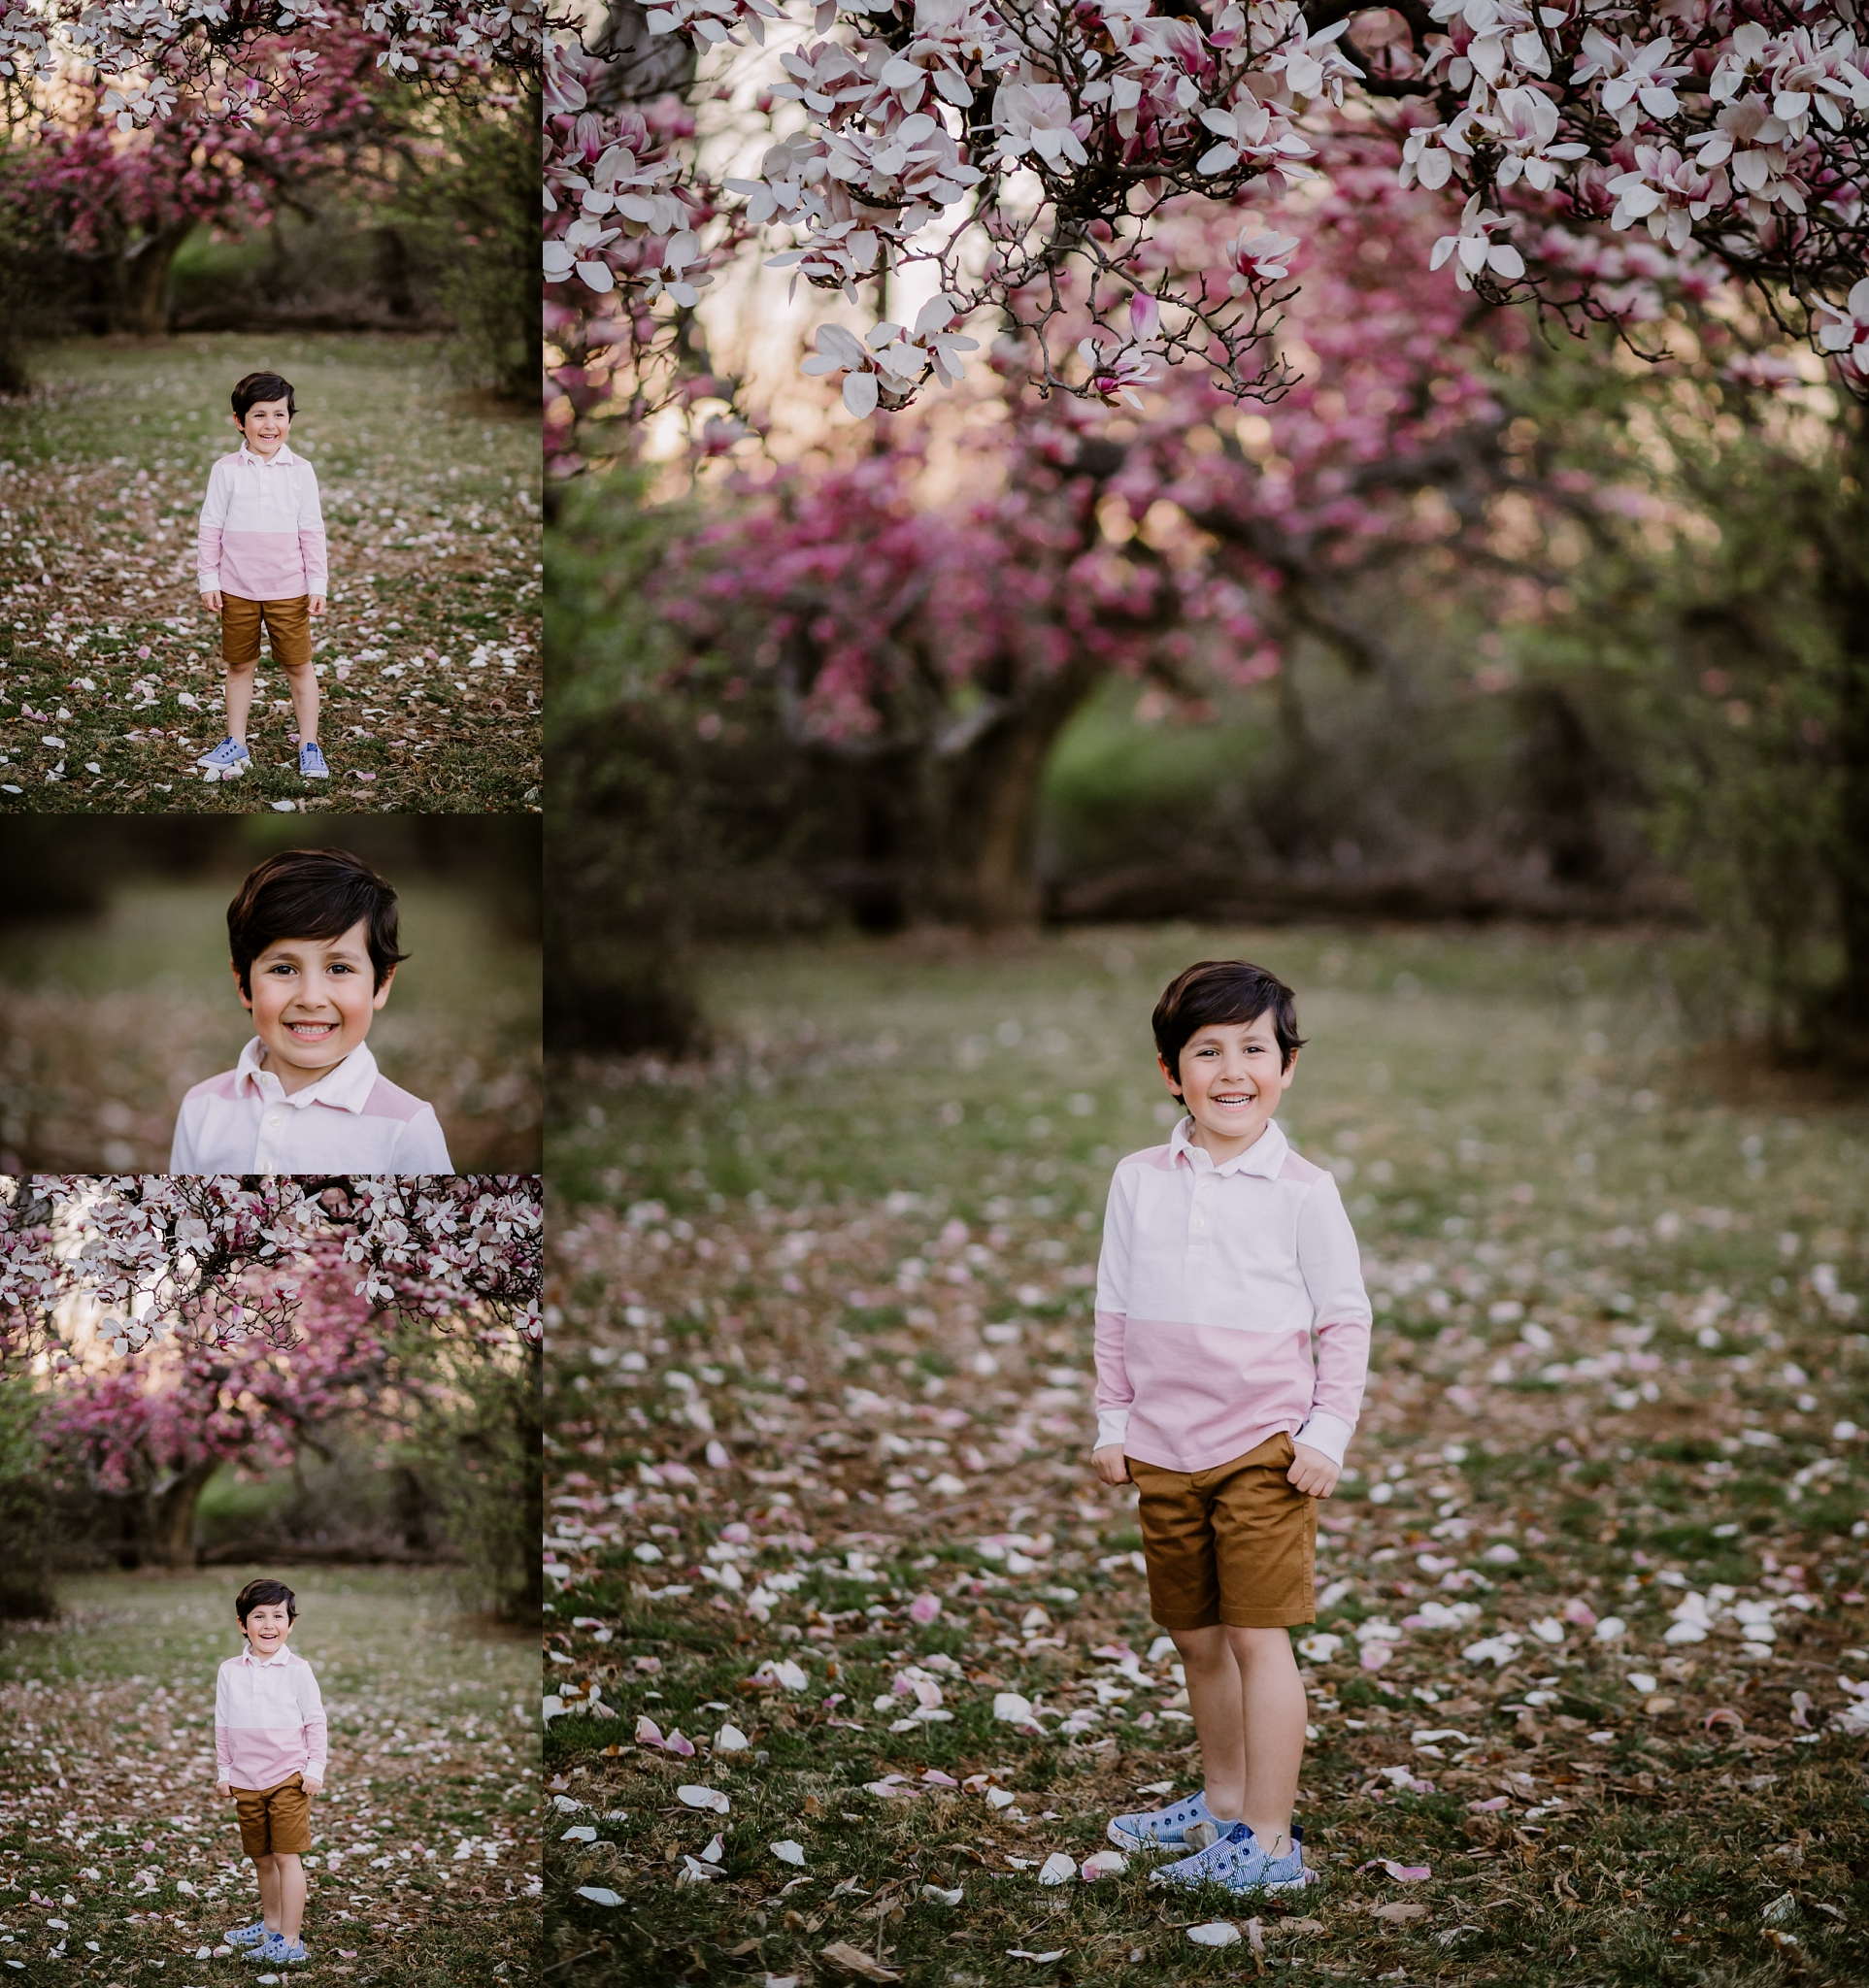 bethesda-md-photographer-spring-blossoms